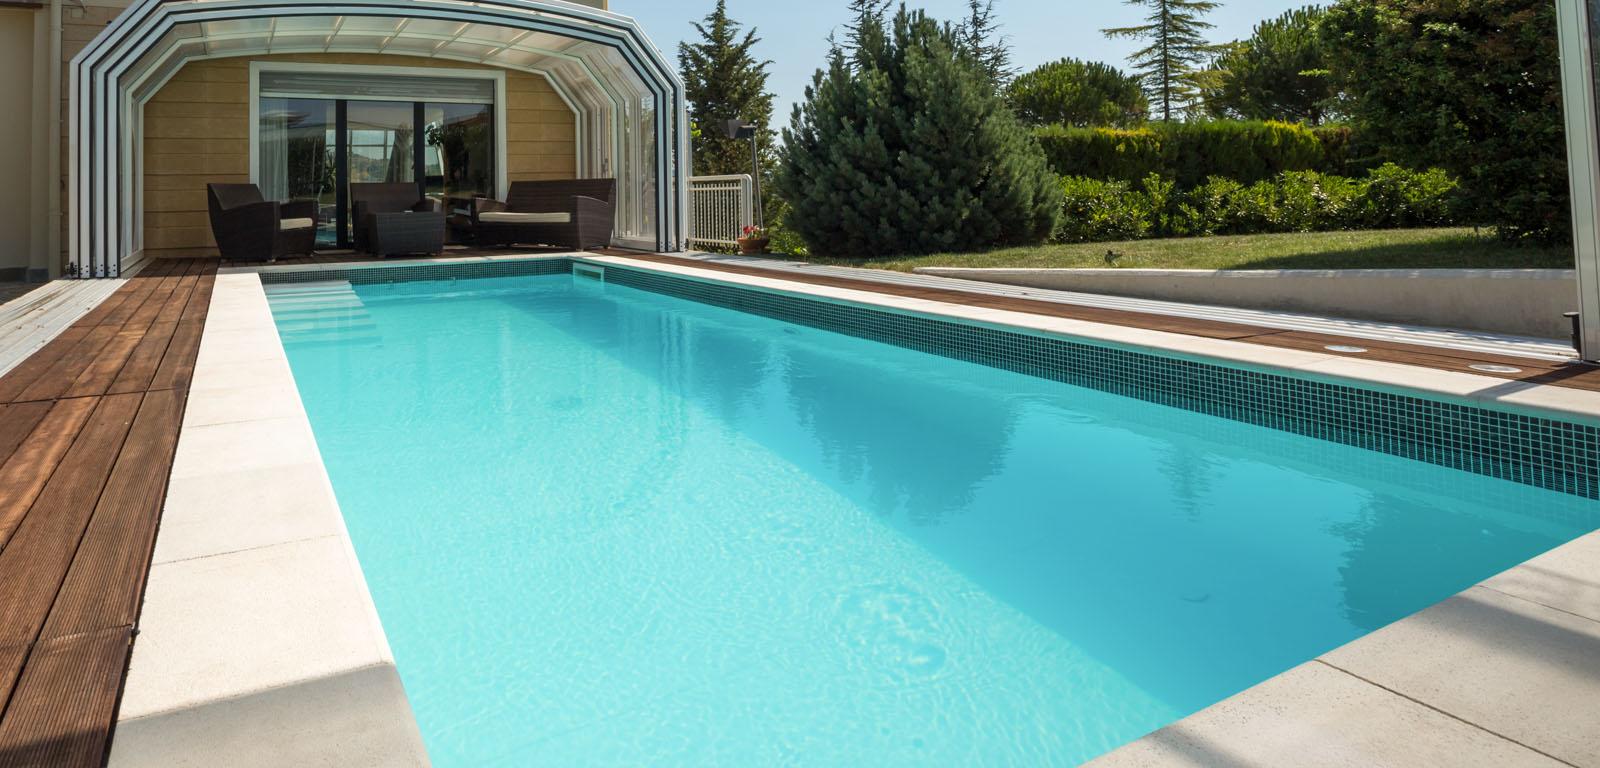 piscine sport per allenarti in piscina a casa piscine. Black Bedroom Furniture Sets. Home Design Ideas